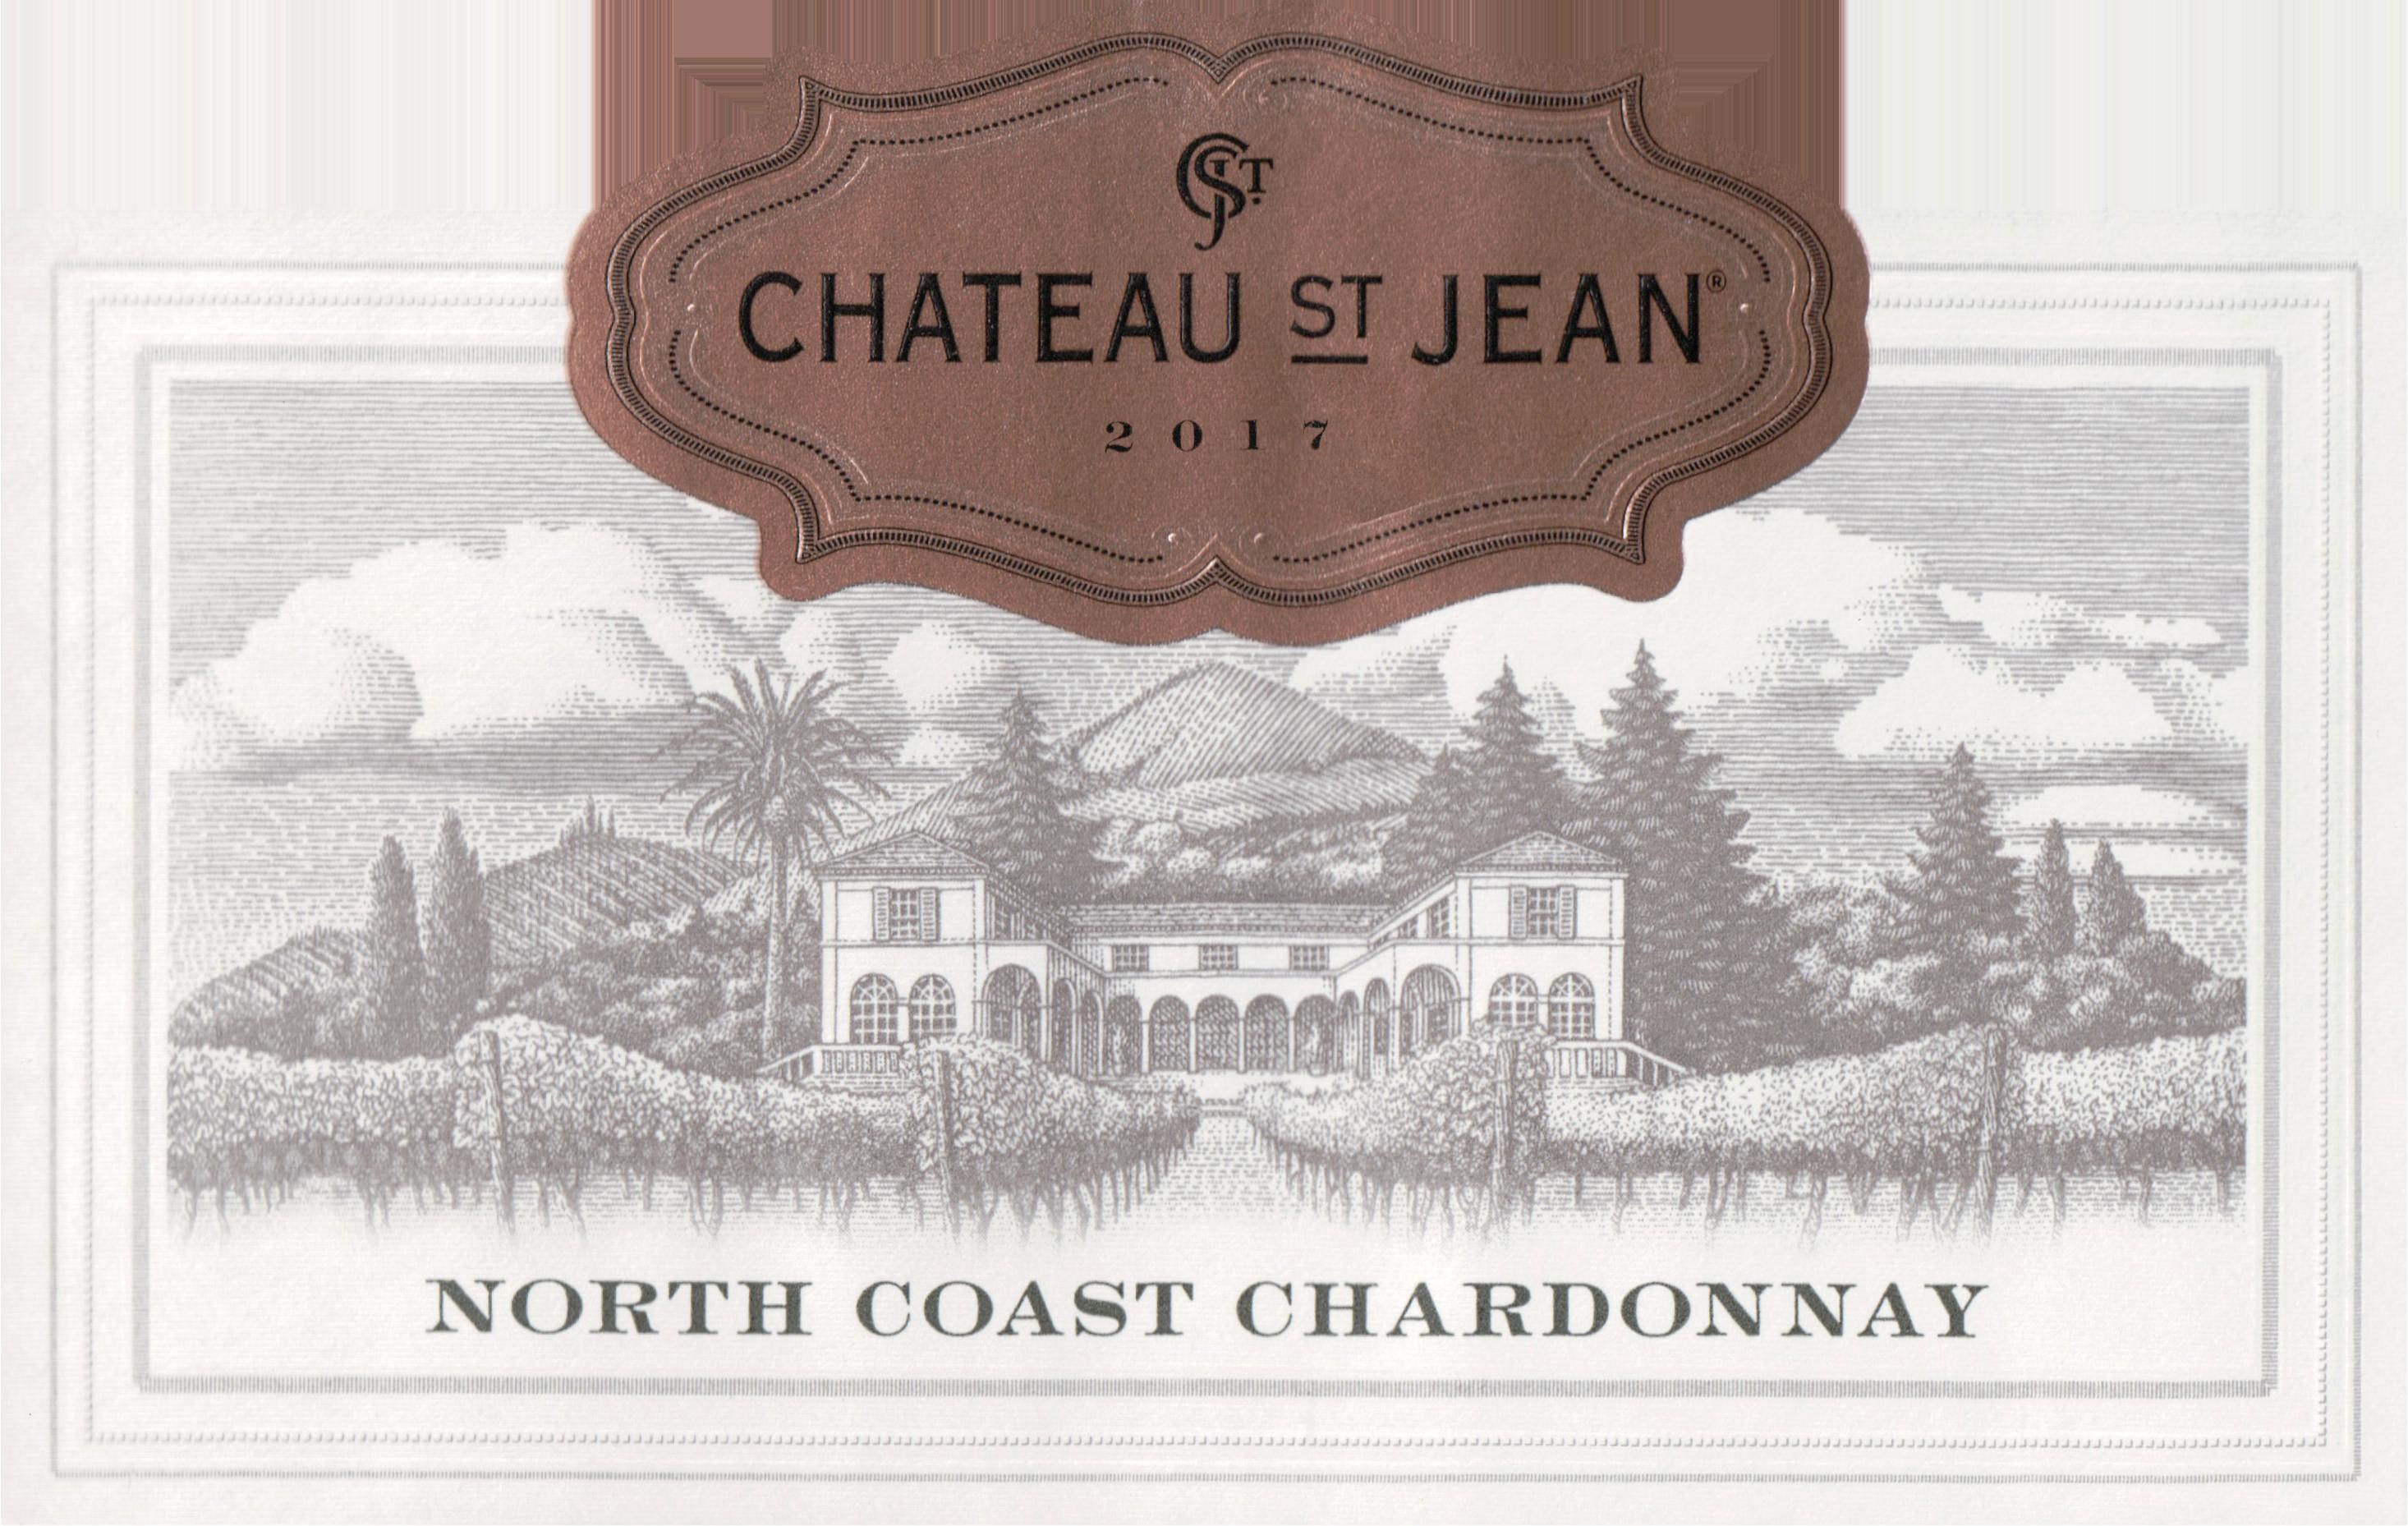 Chateau St Jean North Coast Chardonnay 2017